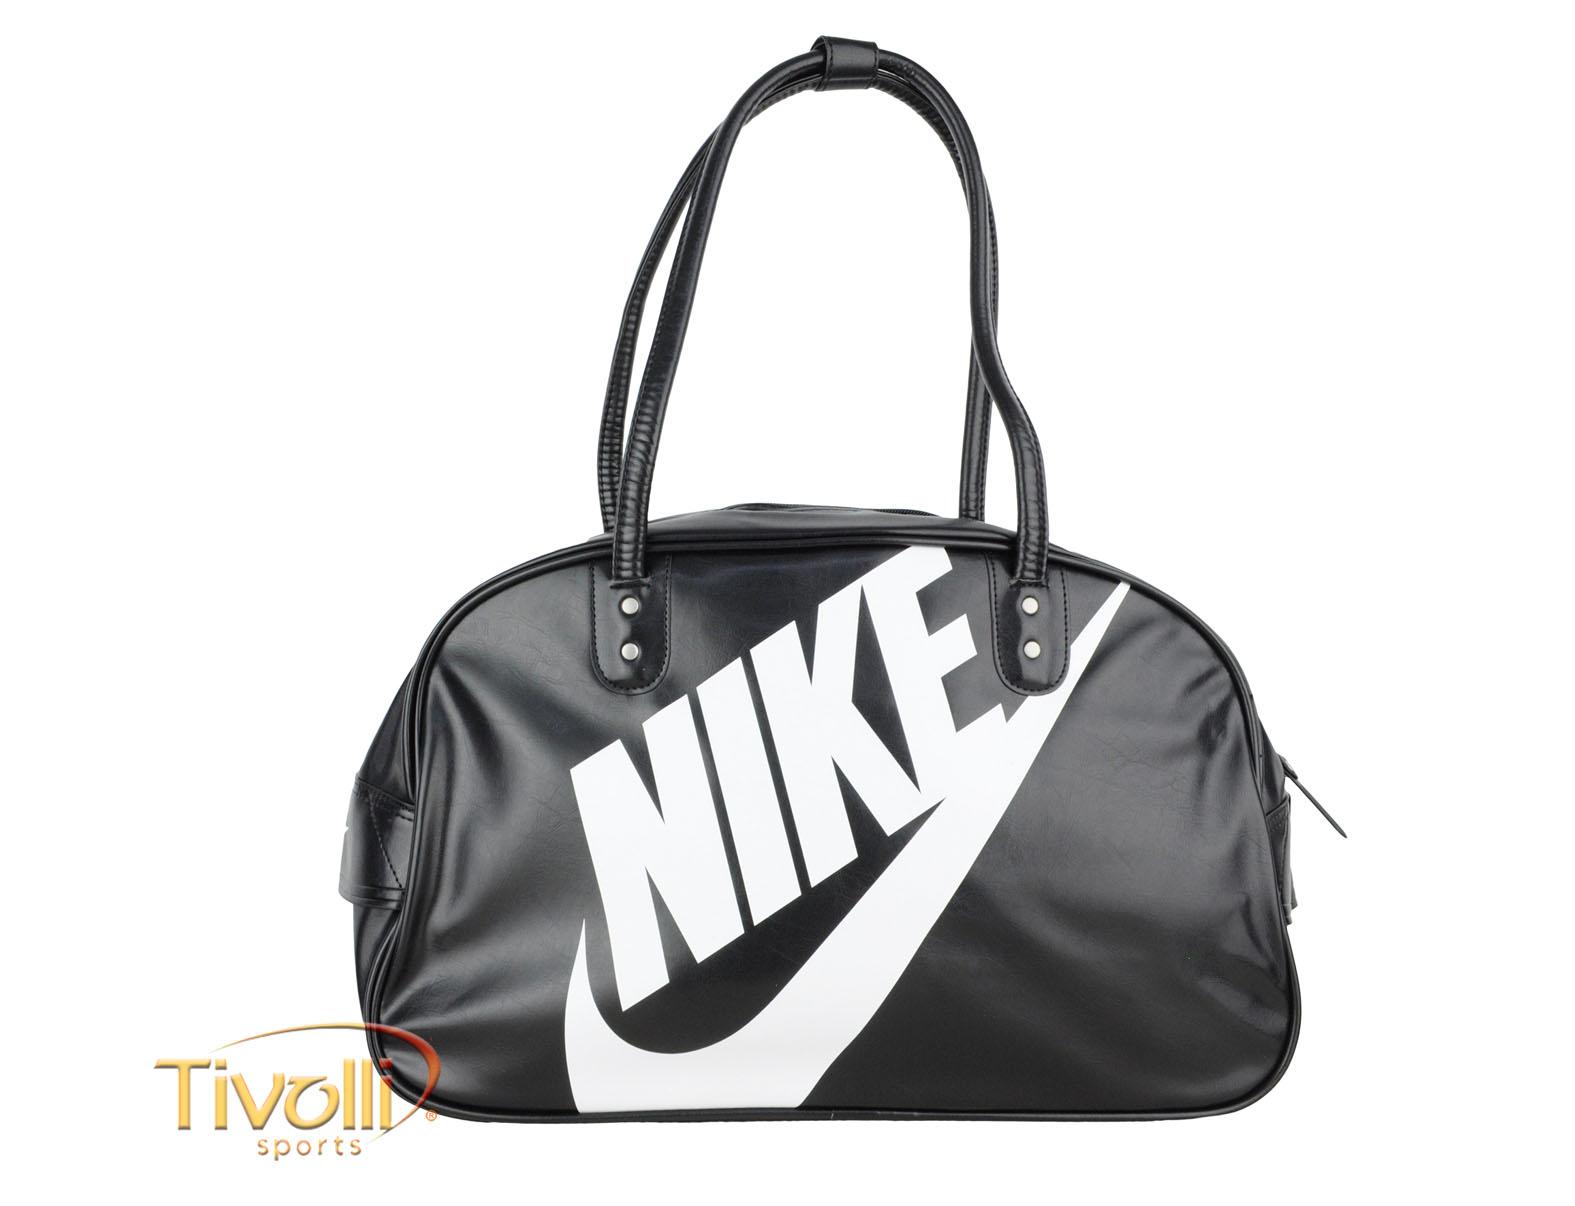 Club Bolsa Branca Si Nike Heritage Baggt; Shoulder Preta E Geanta 8PkXw0nON